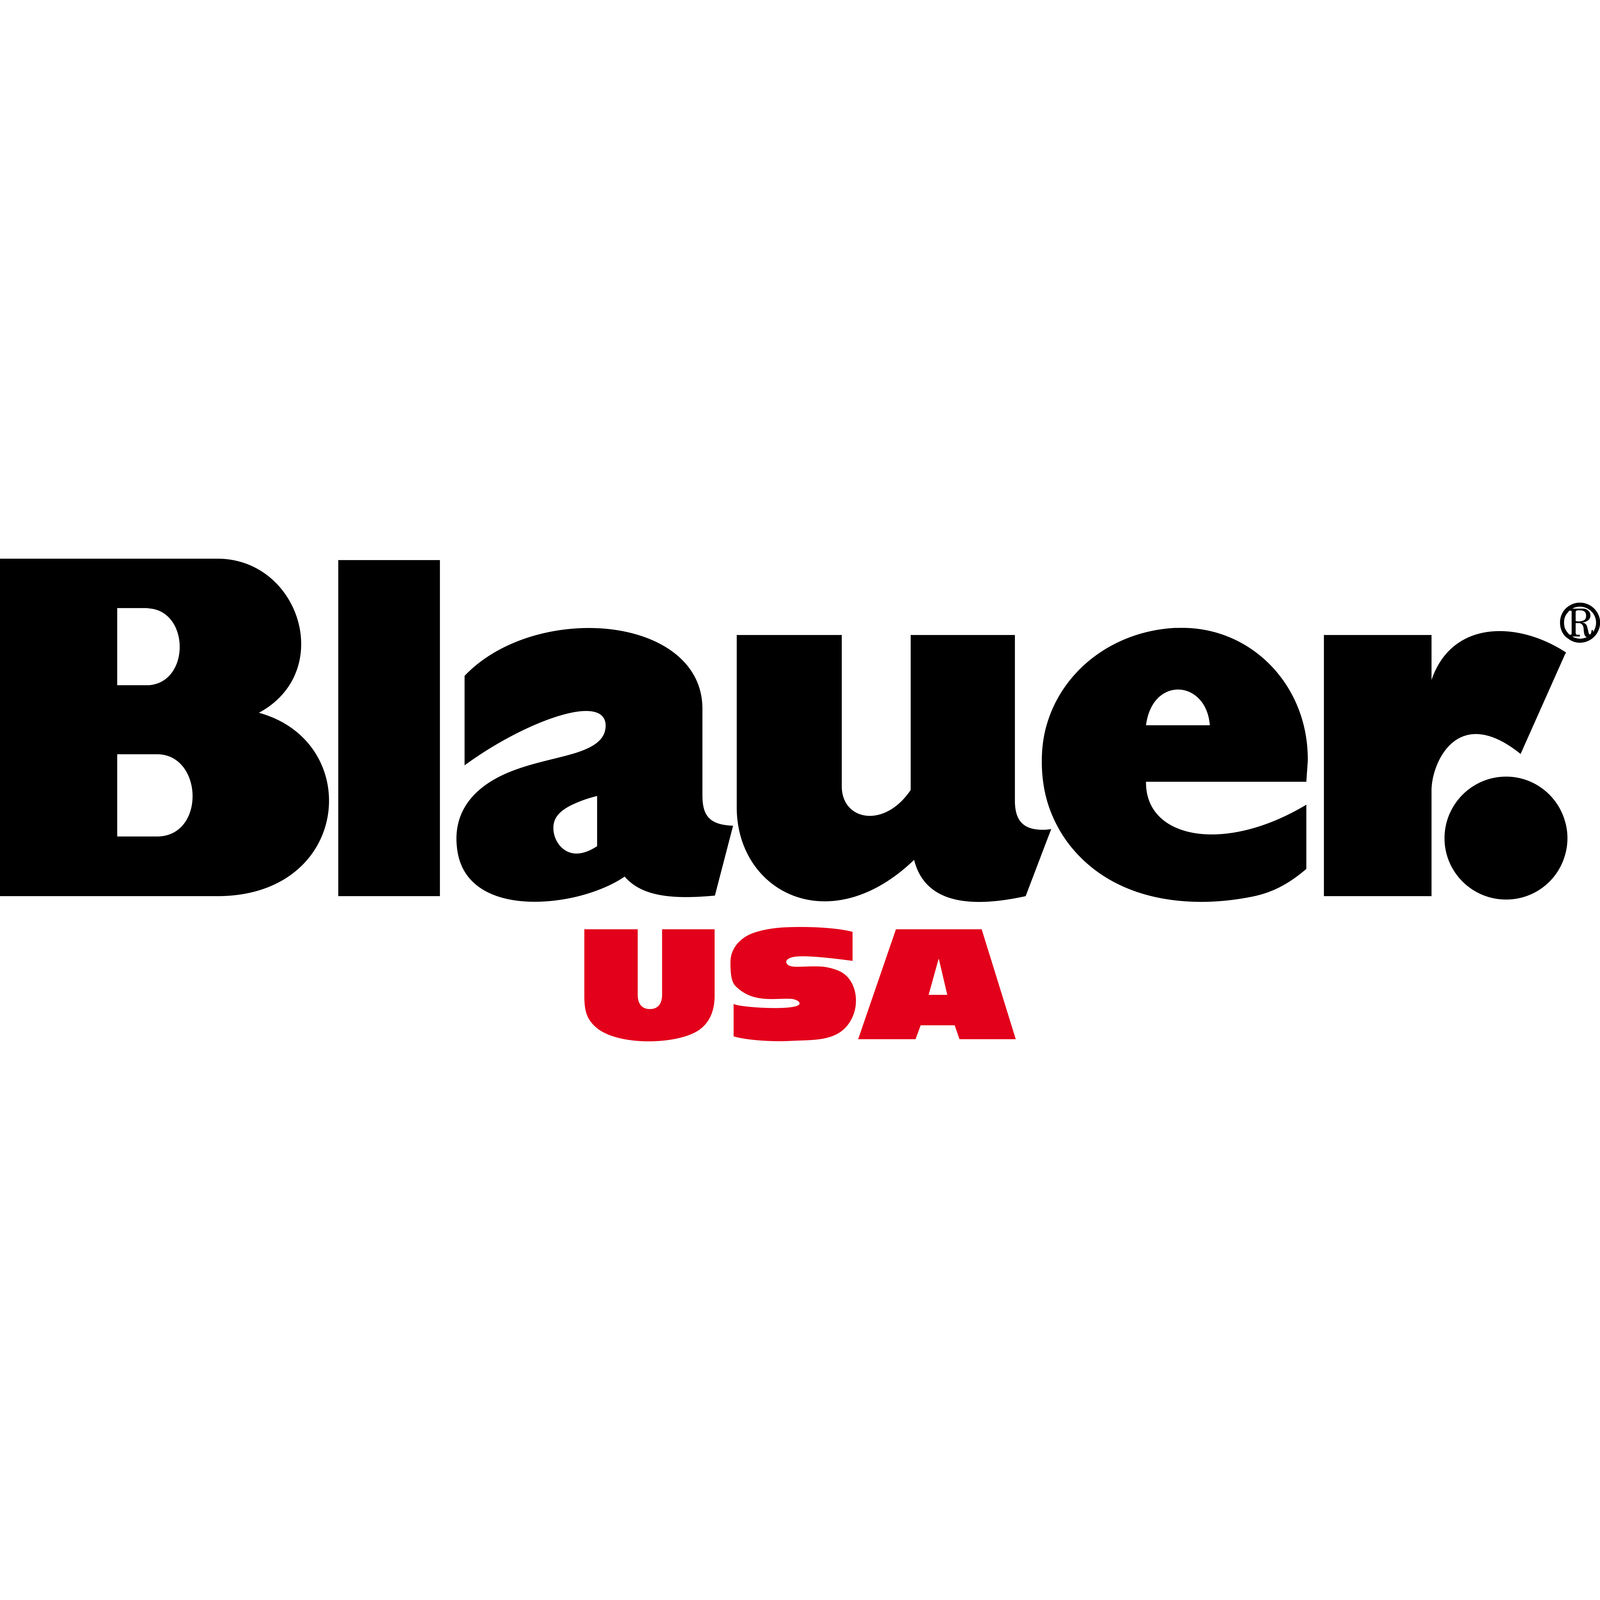 Blauer USA® (Image 1)